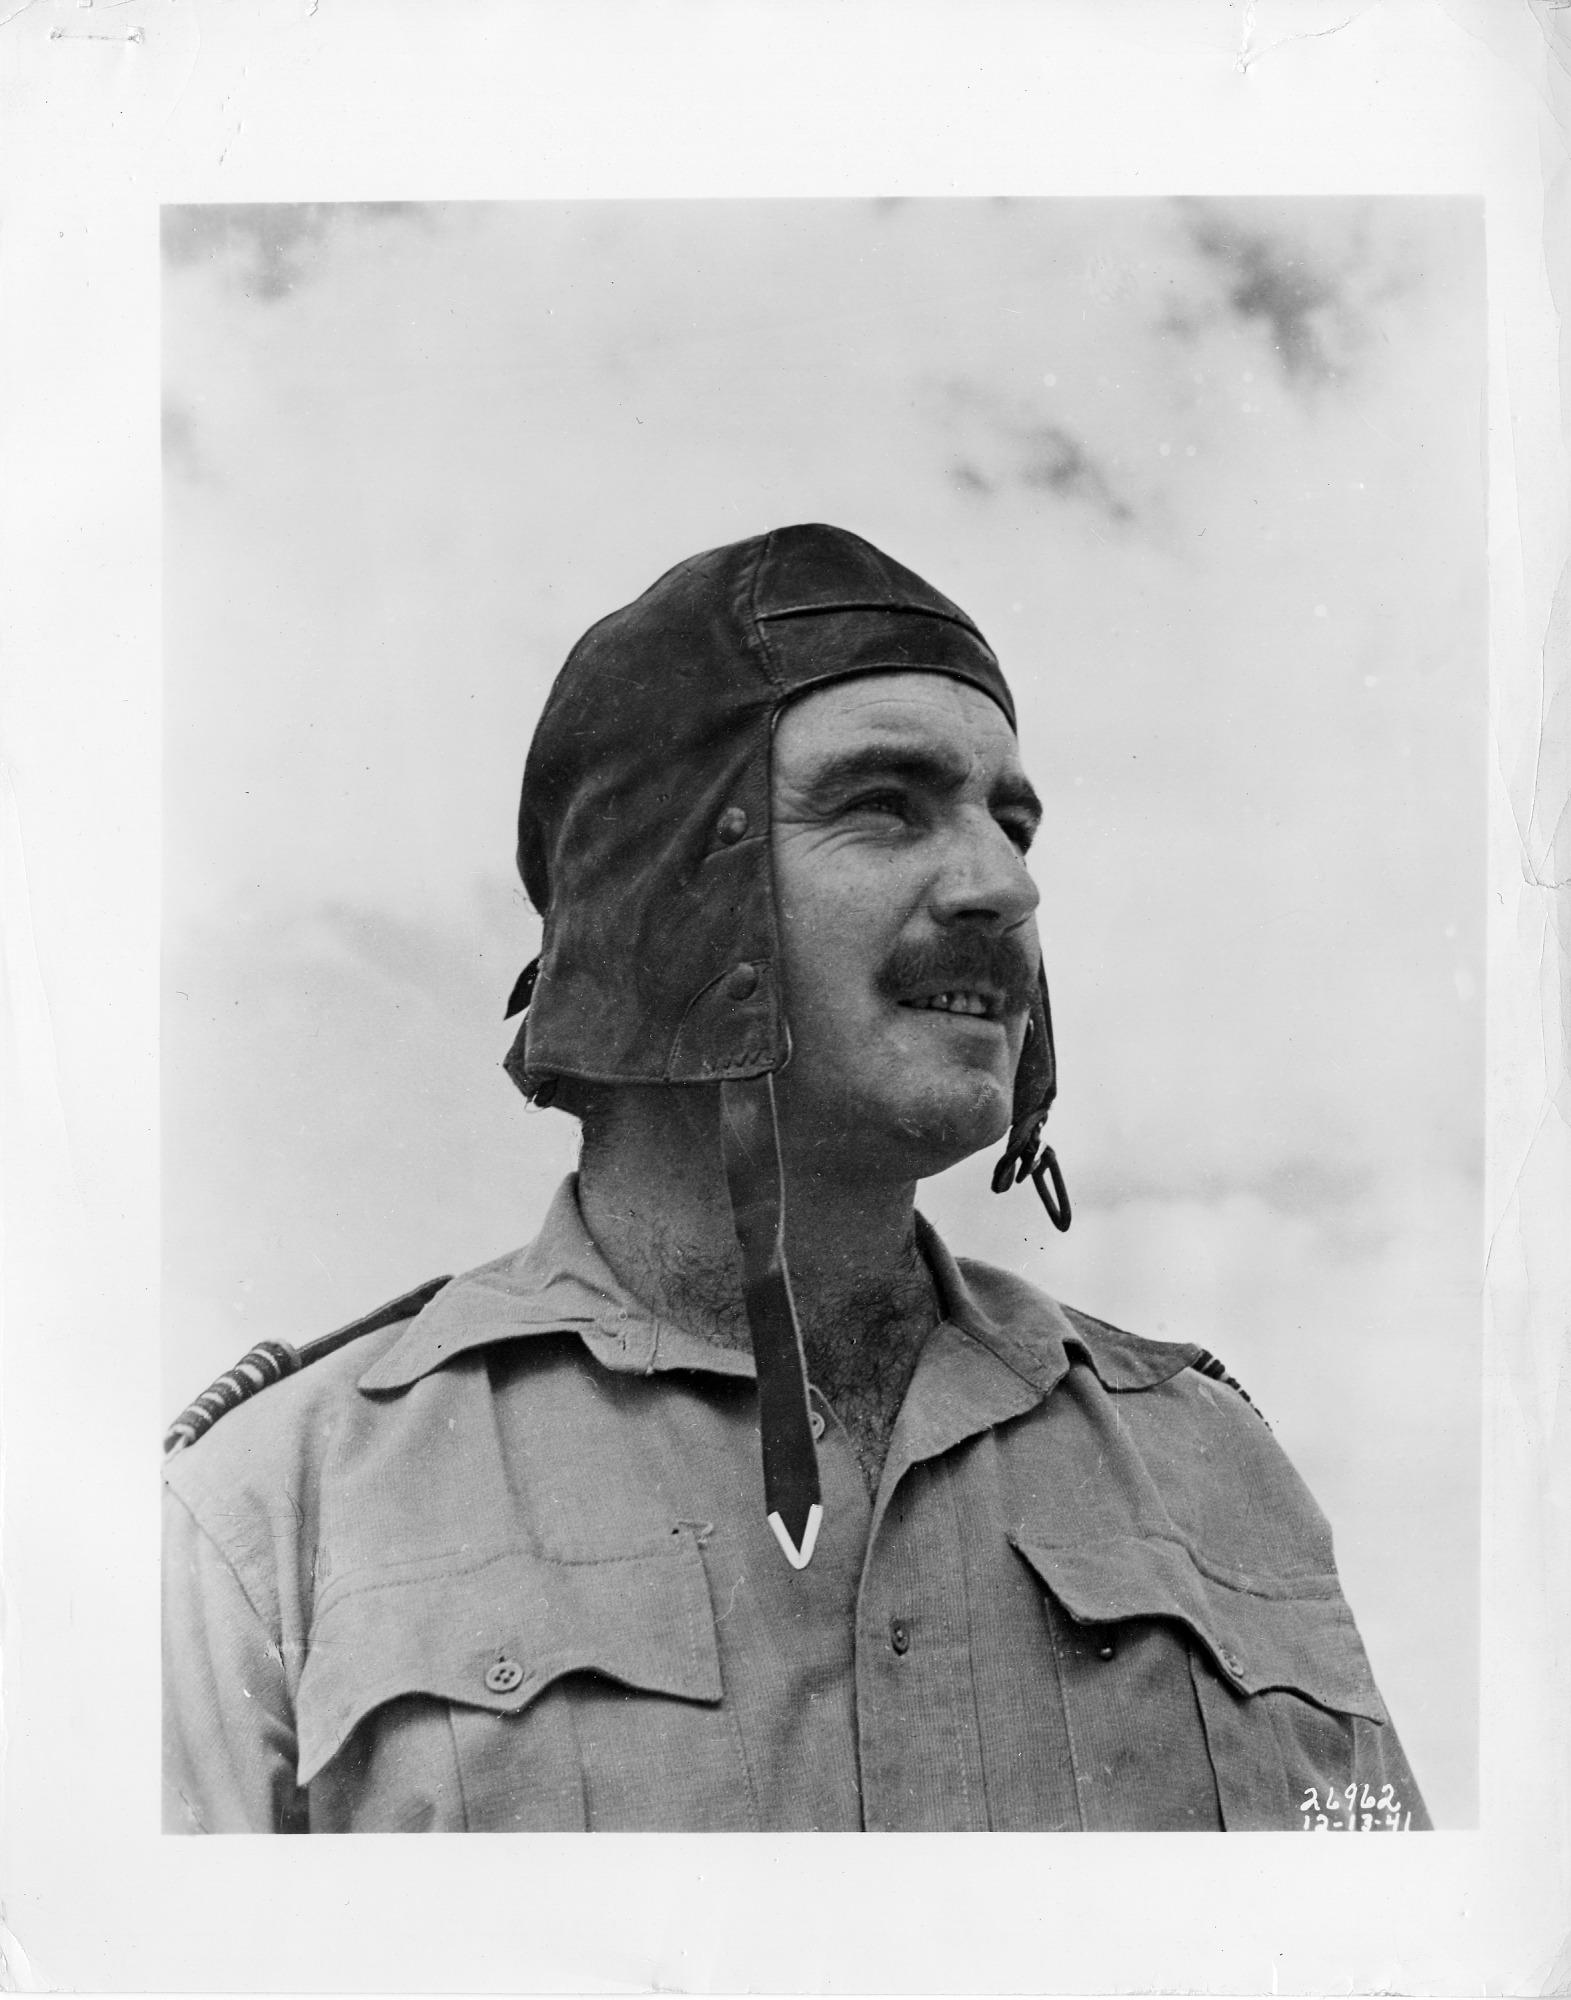 Alan McDonald Bowman (d. November 1941)